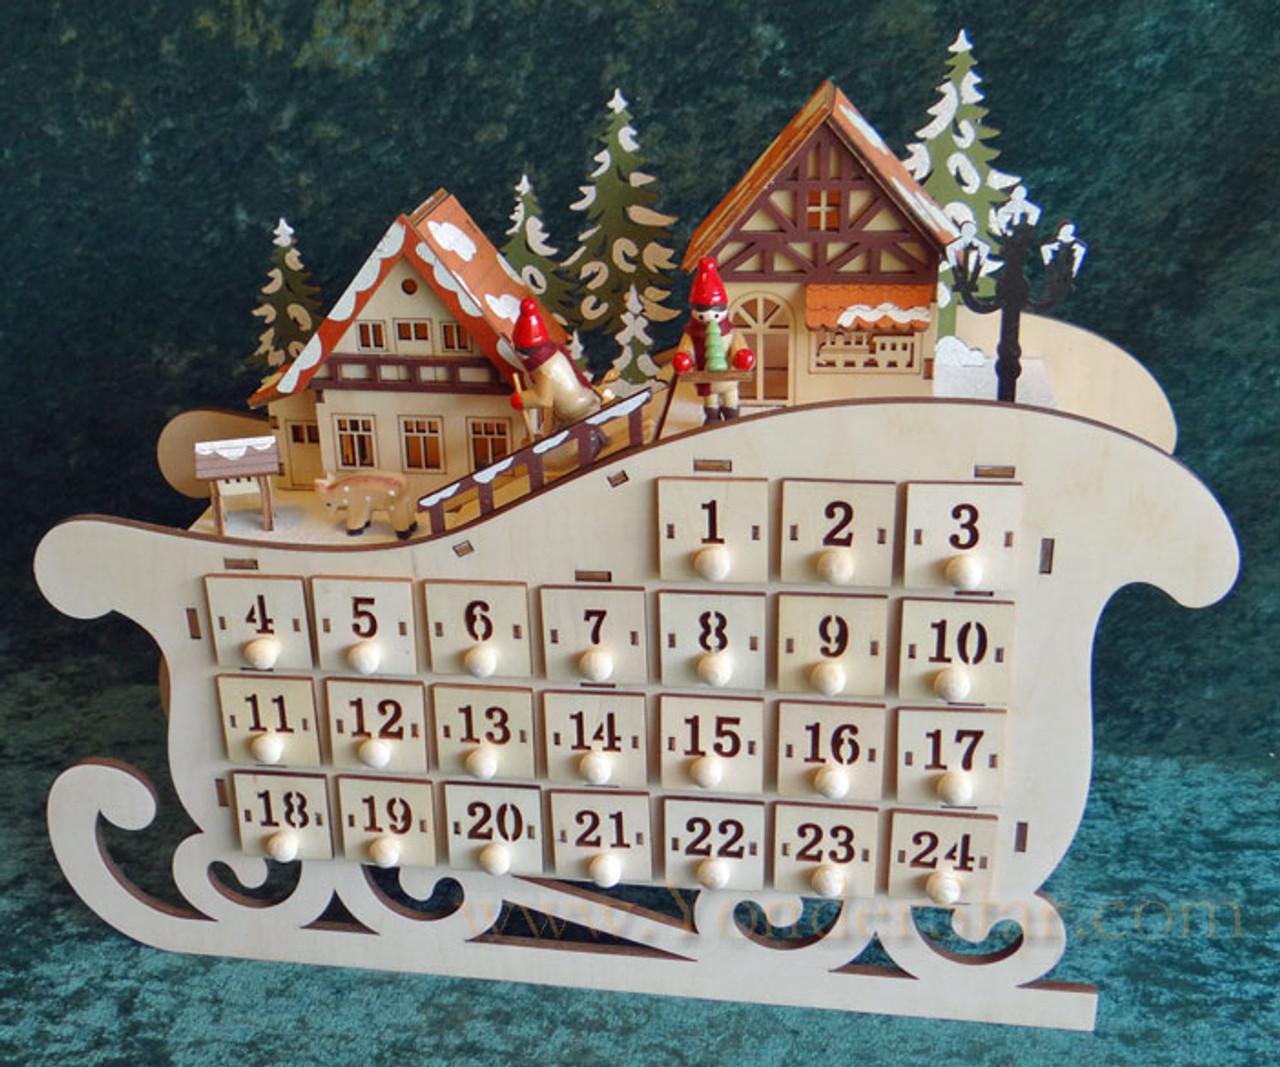 Lighted Wooden Advent Calendar Sleigh Ride Yonder Star Christmas